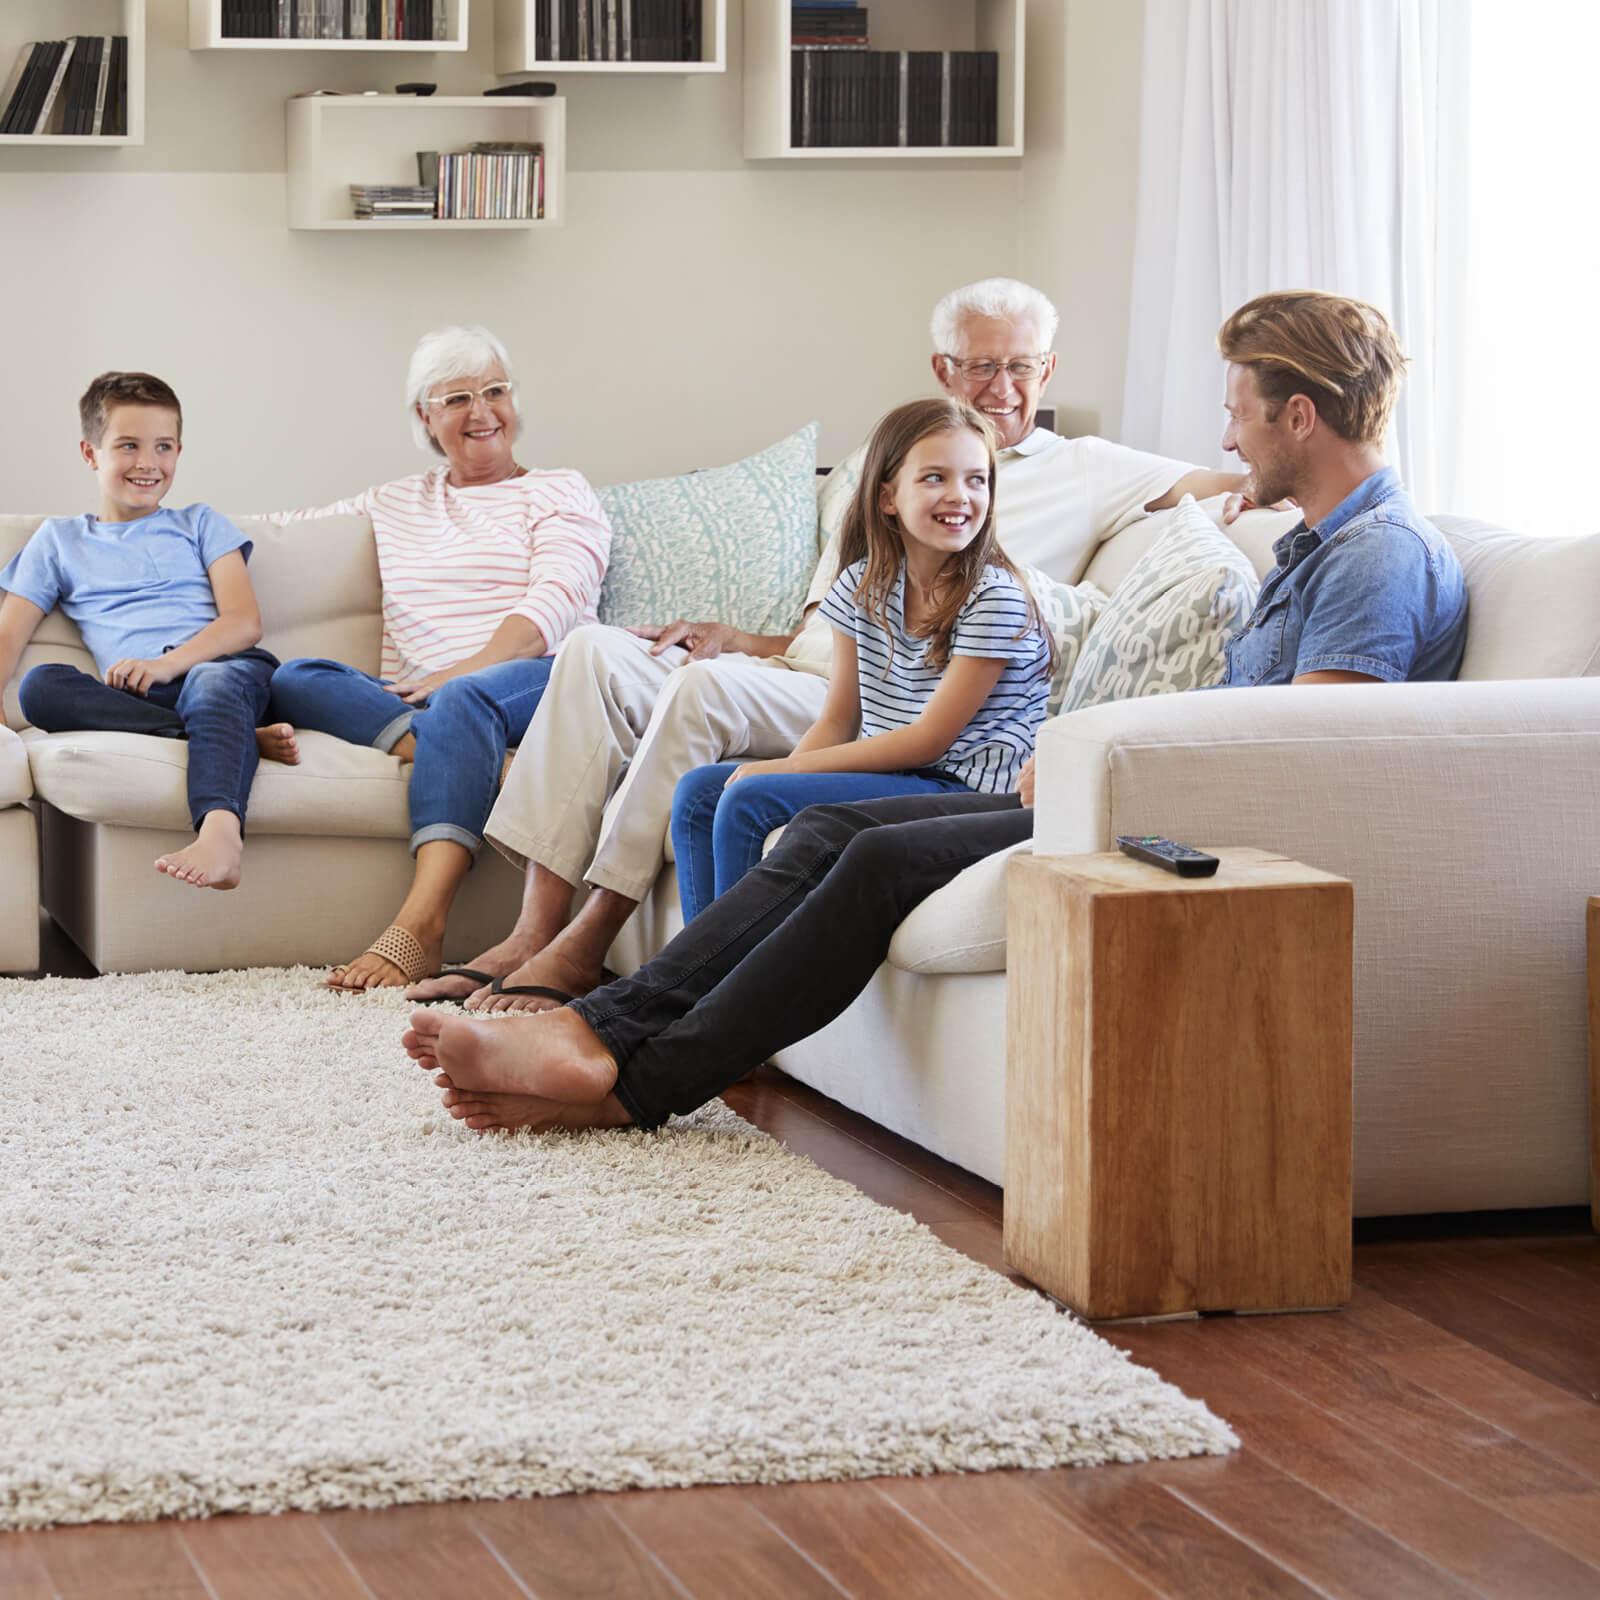 Family Sitting Around an Area Rug